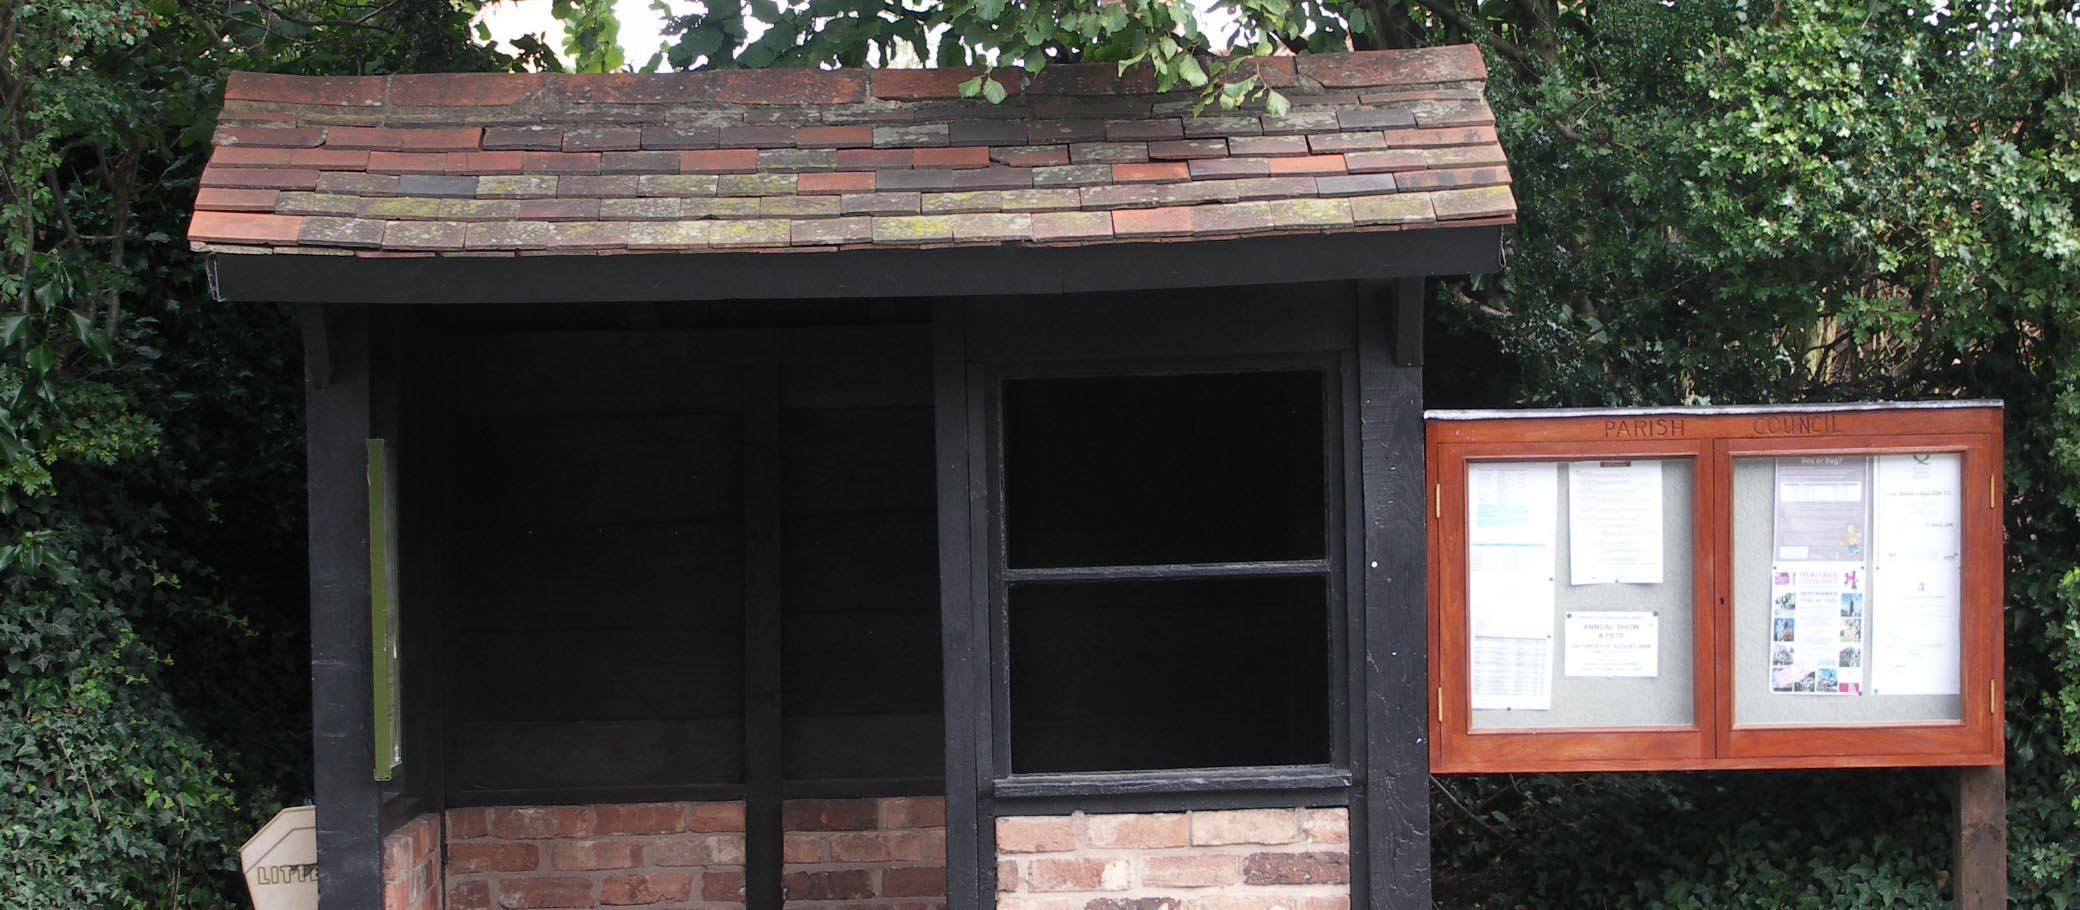 Warwick Road Bus Stop, Leek Wootton